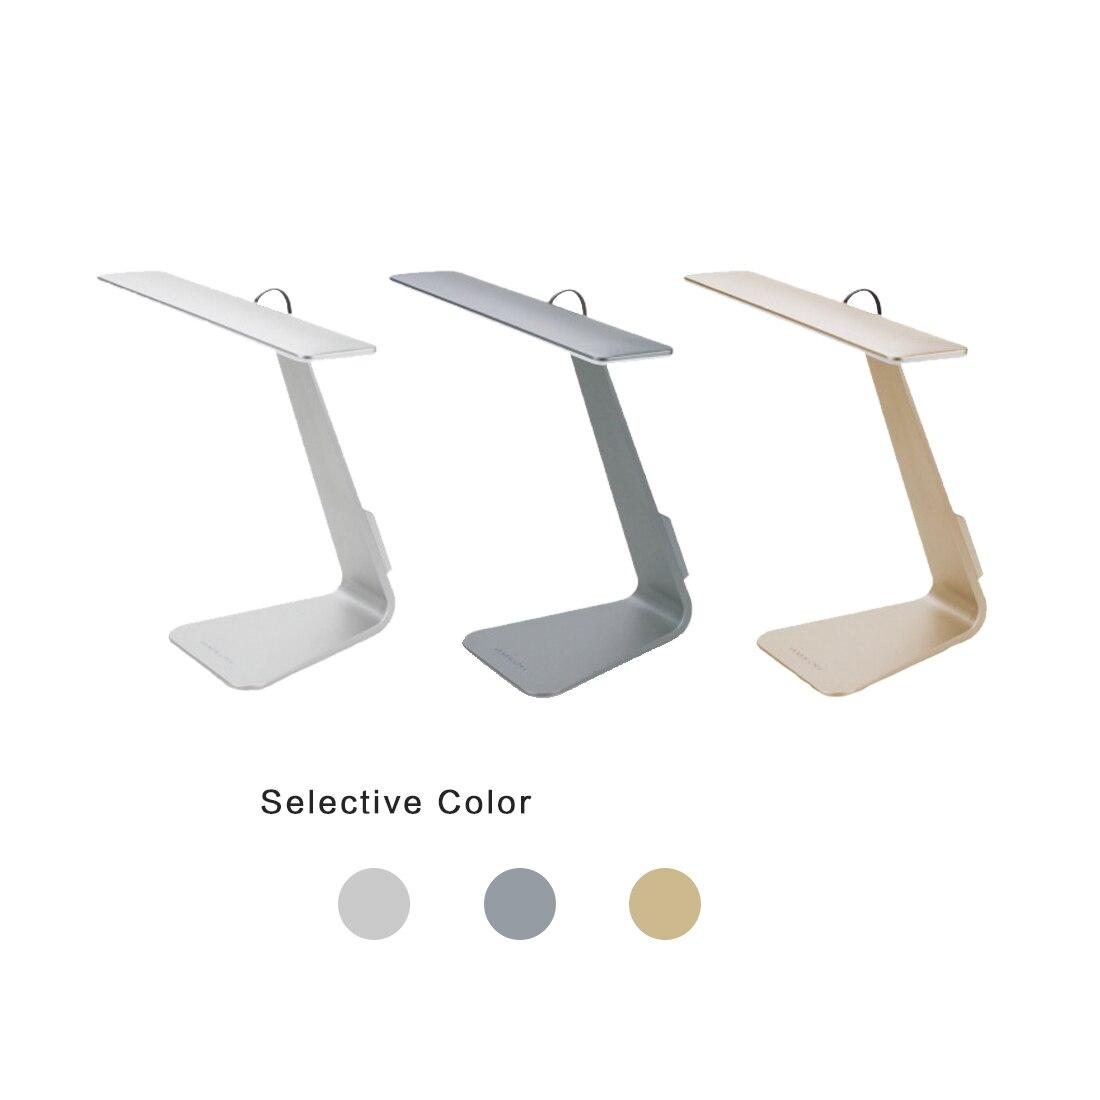 1 stks Moderne creatieve Smart touch bureaulamp oplaadbare Ogen - Binnenverlichting